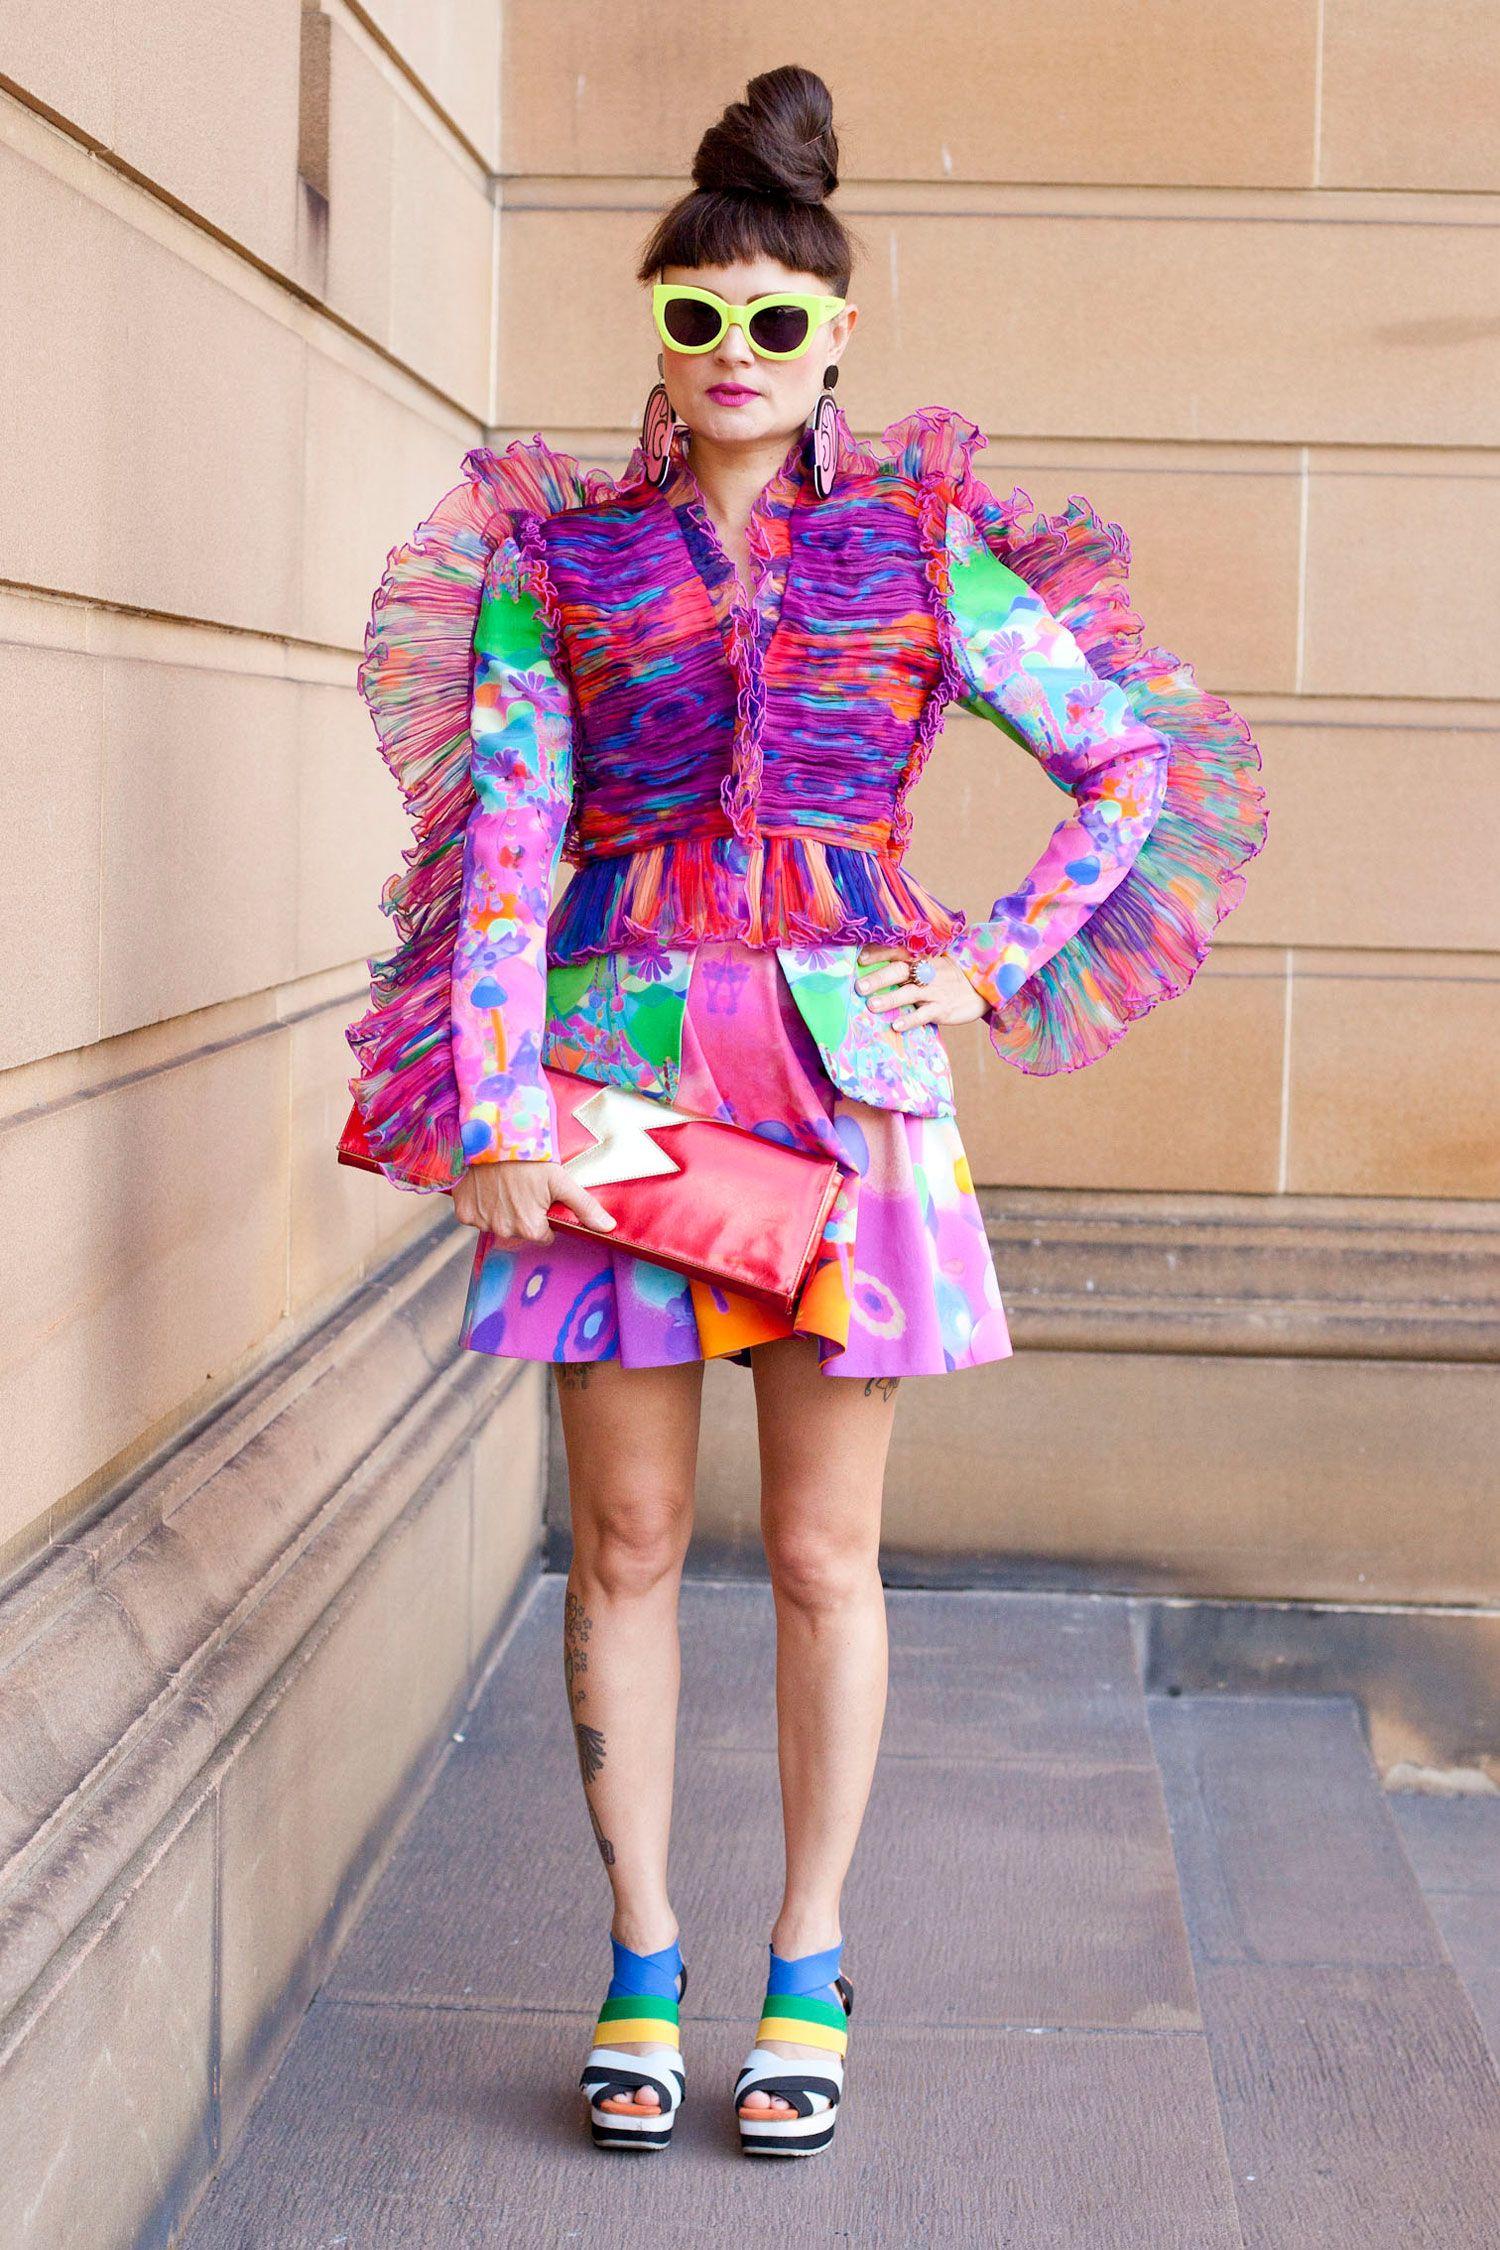 https://www.cosmopolitan.com/style-beauty/fashion/news/g413/party ...